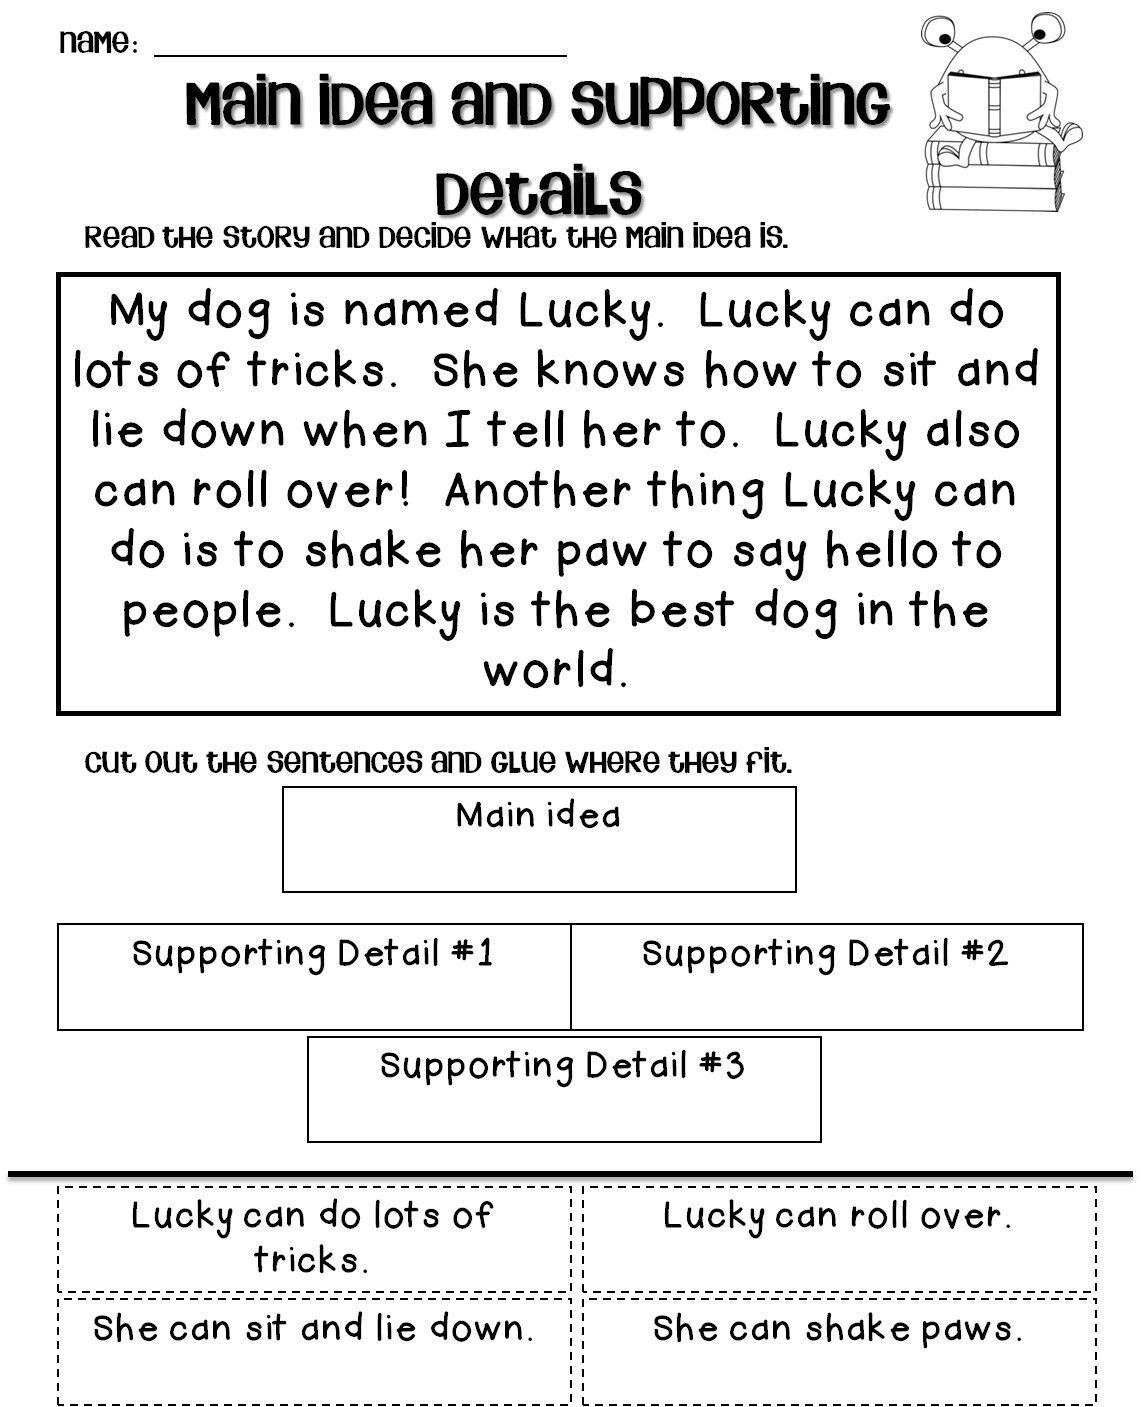 Third Grade Main Idea Worksheets In 2020 Main Idea Worksheet Reading Main Idea Main Idea Third Grade